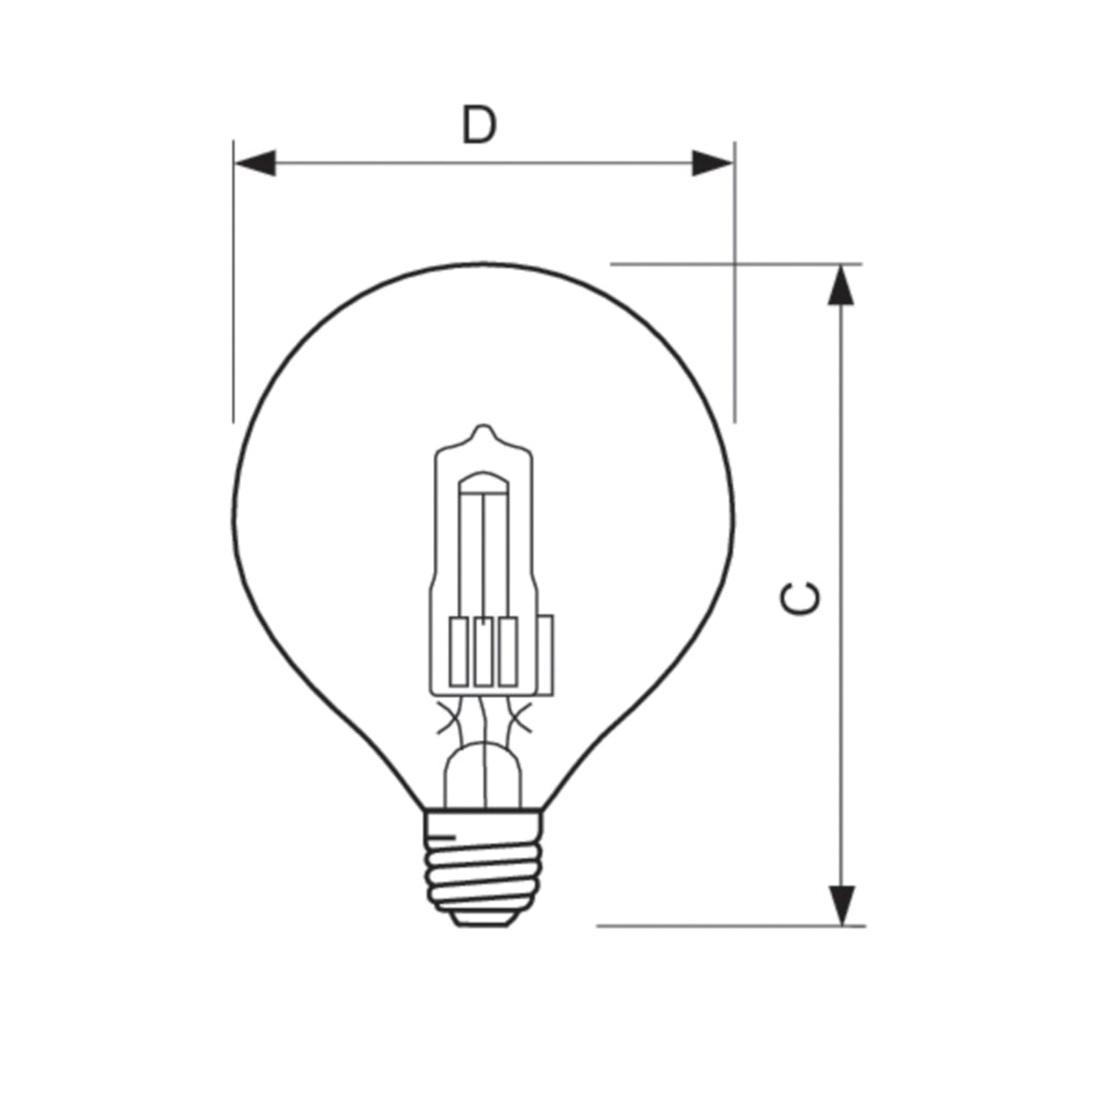 Philips Lighting G16 1 2 Globe Decorative Halogen Lamp E26 Single Contact Medium Base